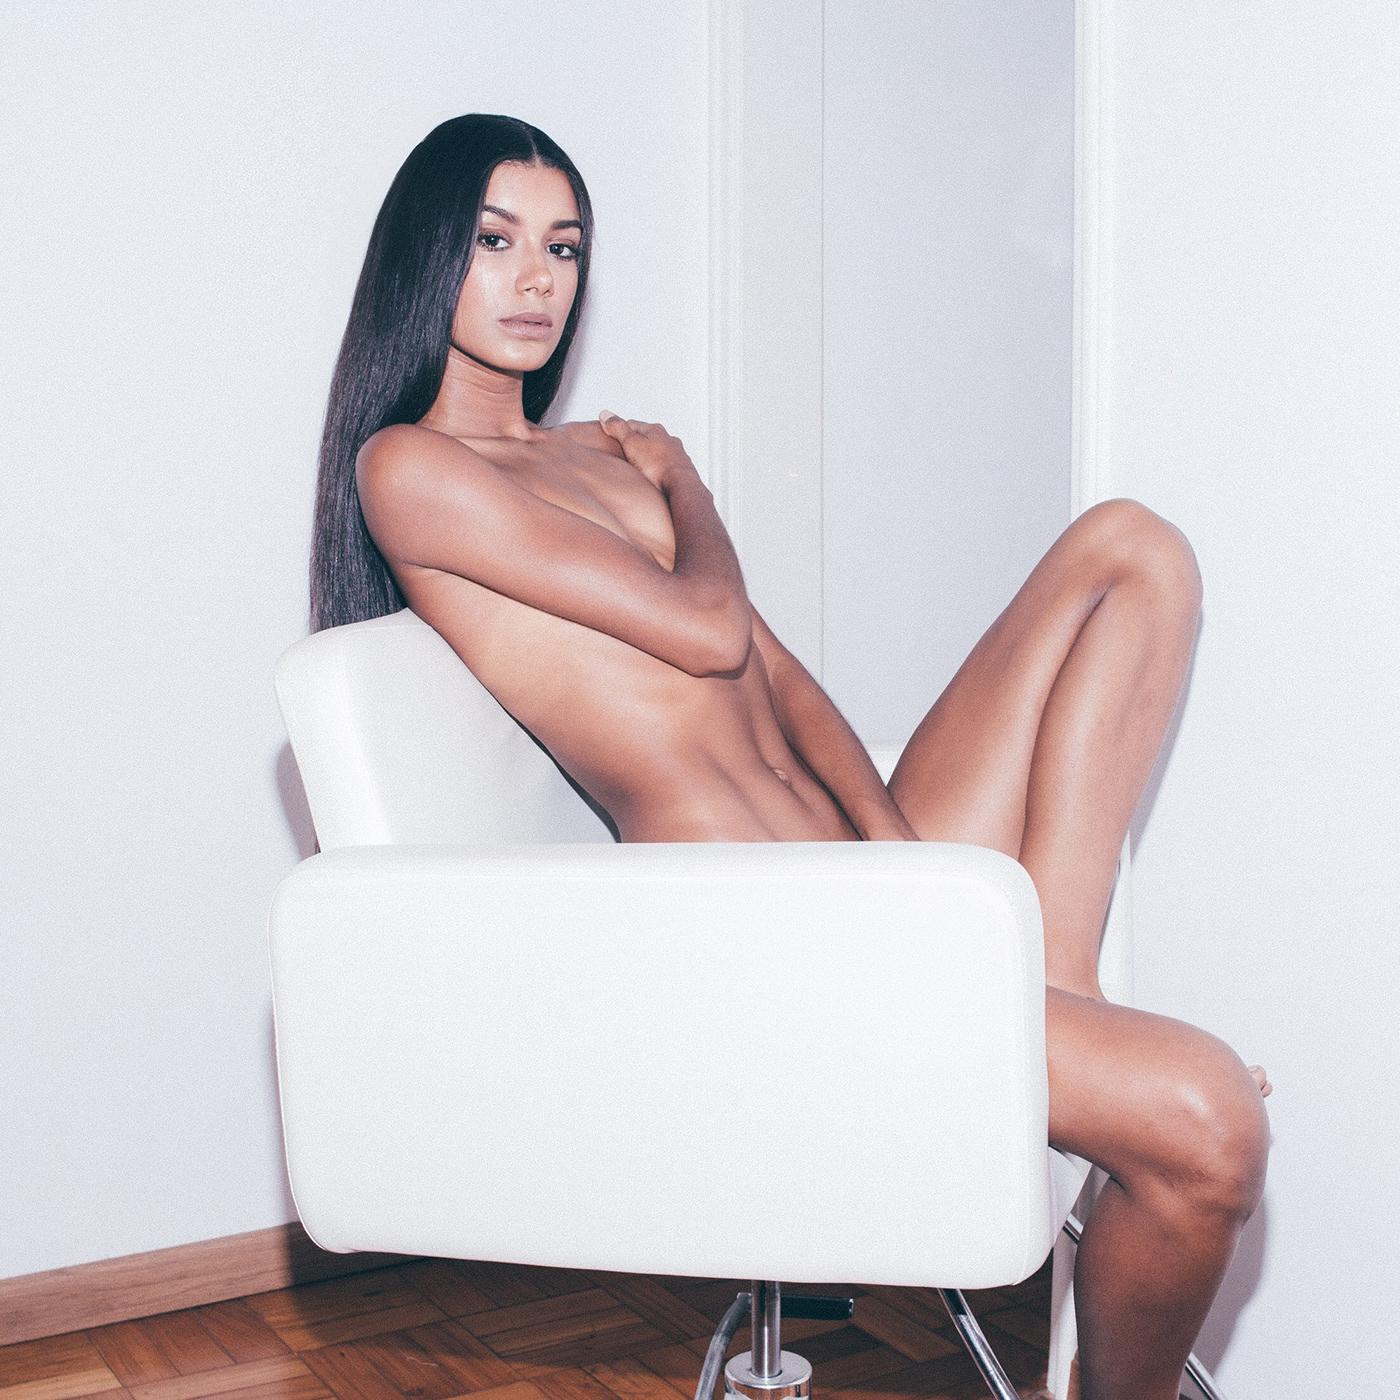 Fashion  woman Flash Canon shooting photoshoot beauty body nude sexy apartment minimalist clean White